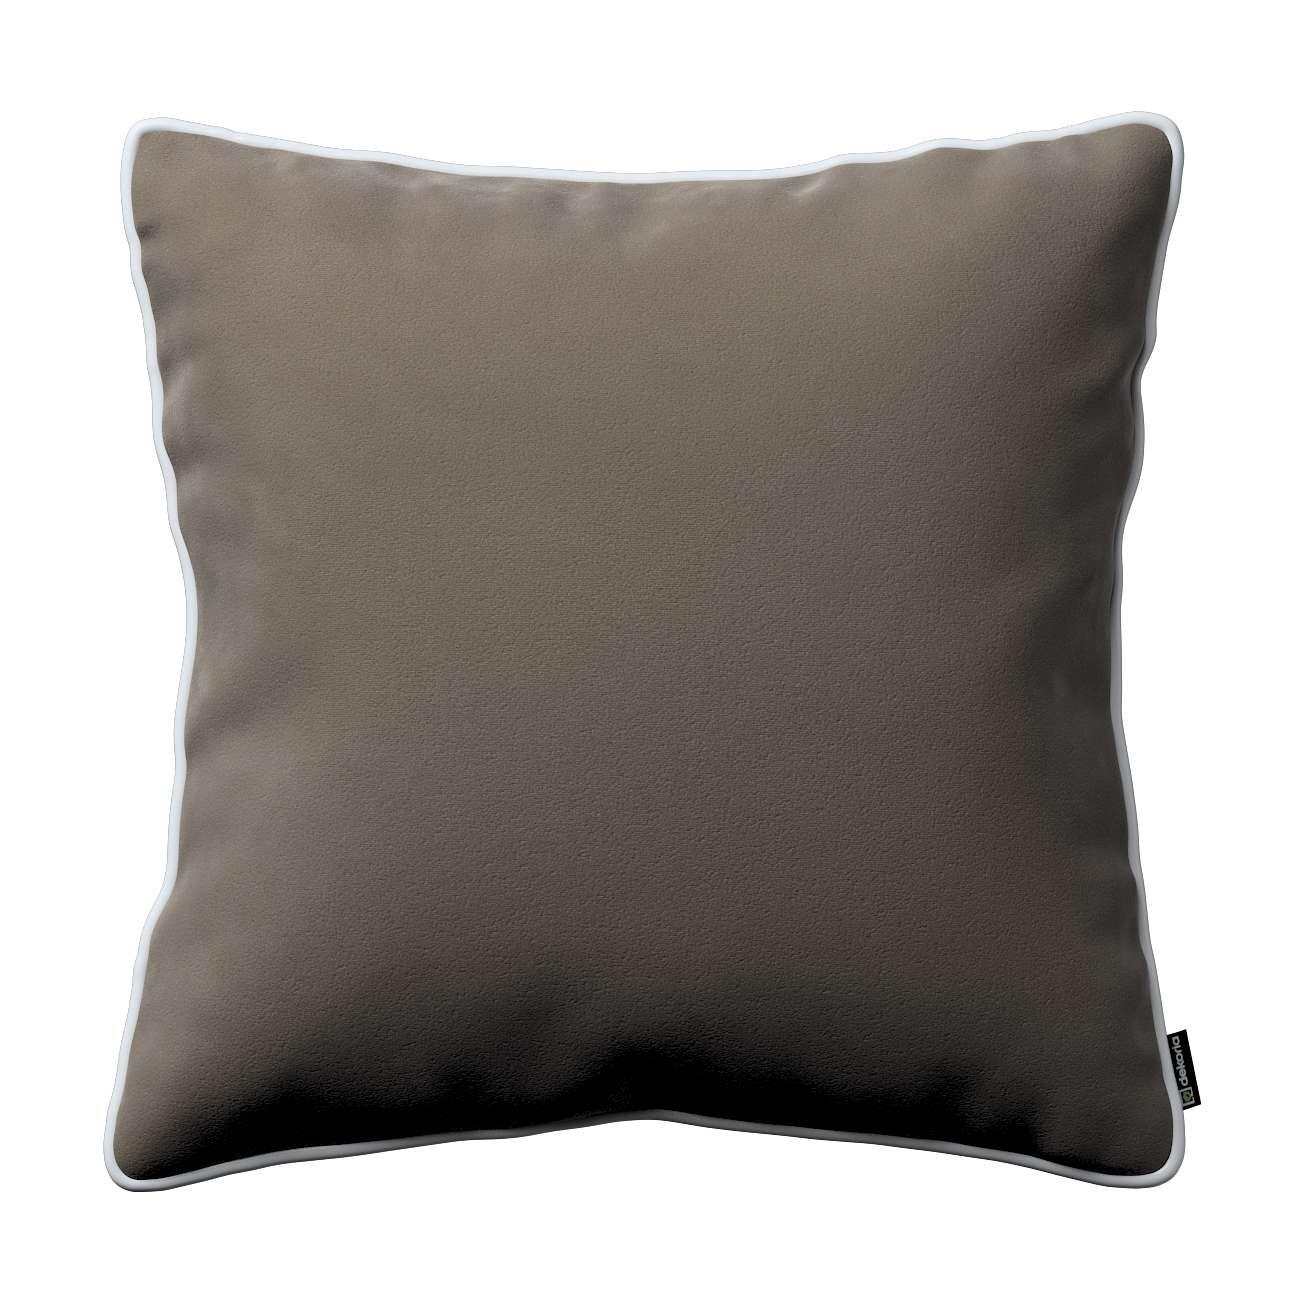 kissenh lle laura grau beige 43 43 cm velvet modecentren imc. Black Bedroom Furniture Sets. Home Design Ideas